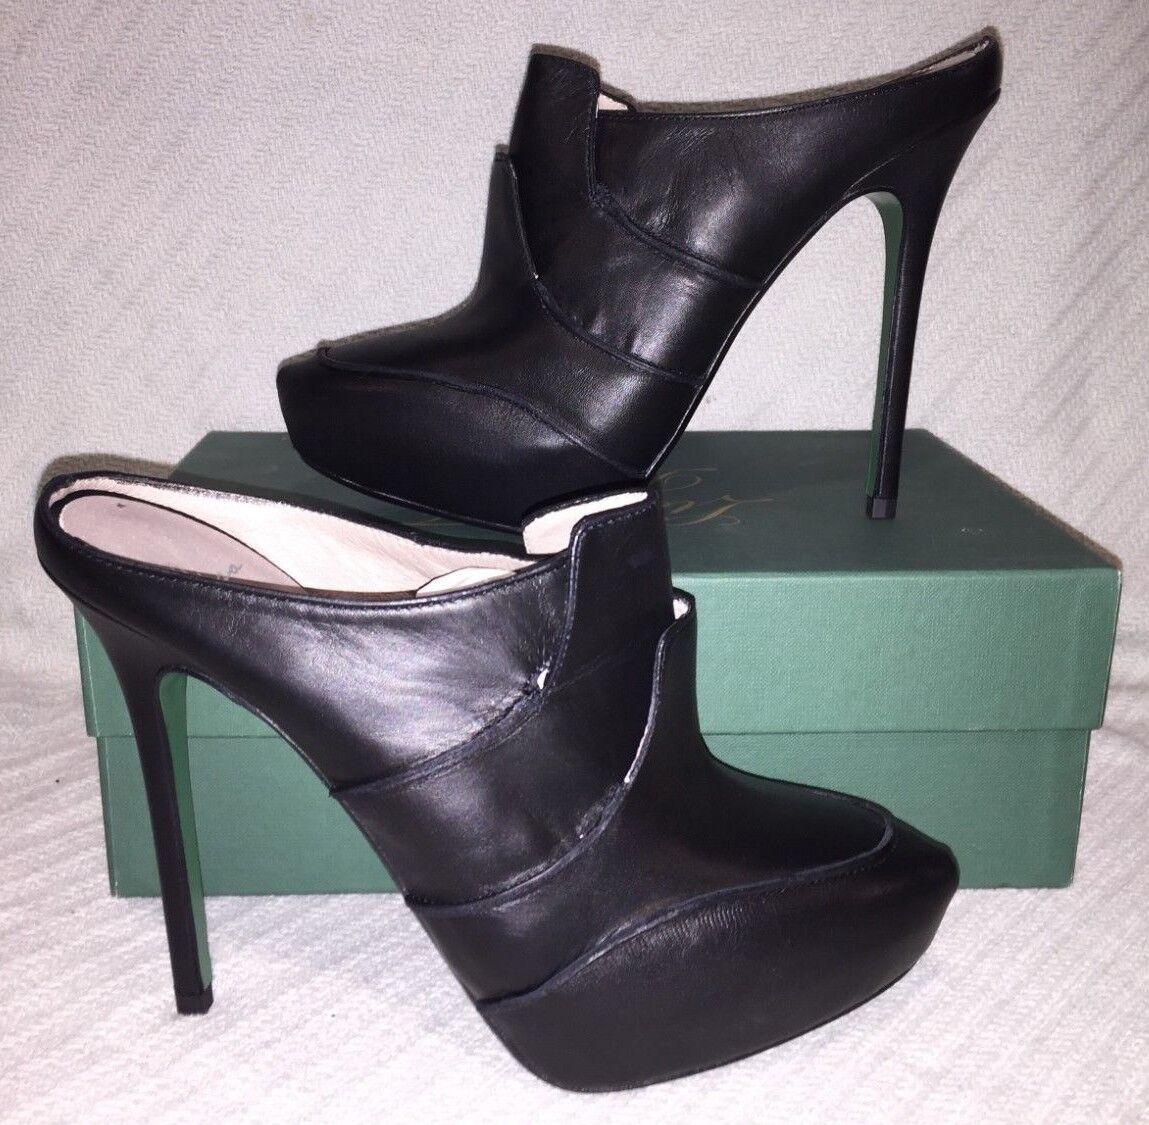 Lisa for Donald J Pliner Cristel-35 Black Vachetta Backless High Stiletto Pumps